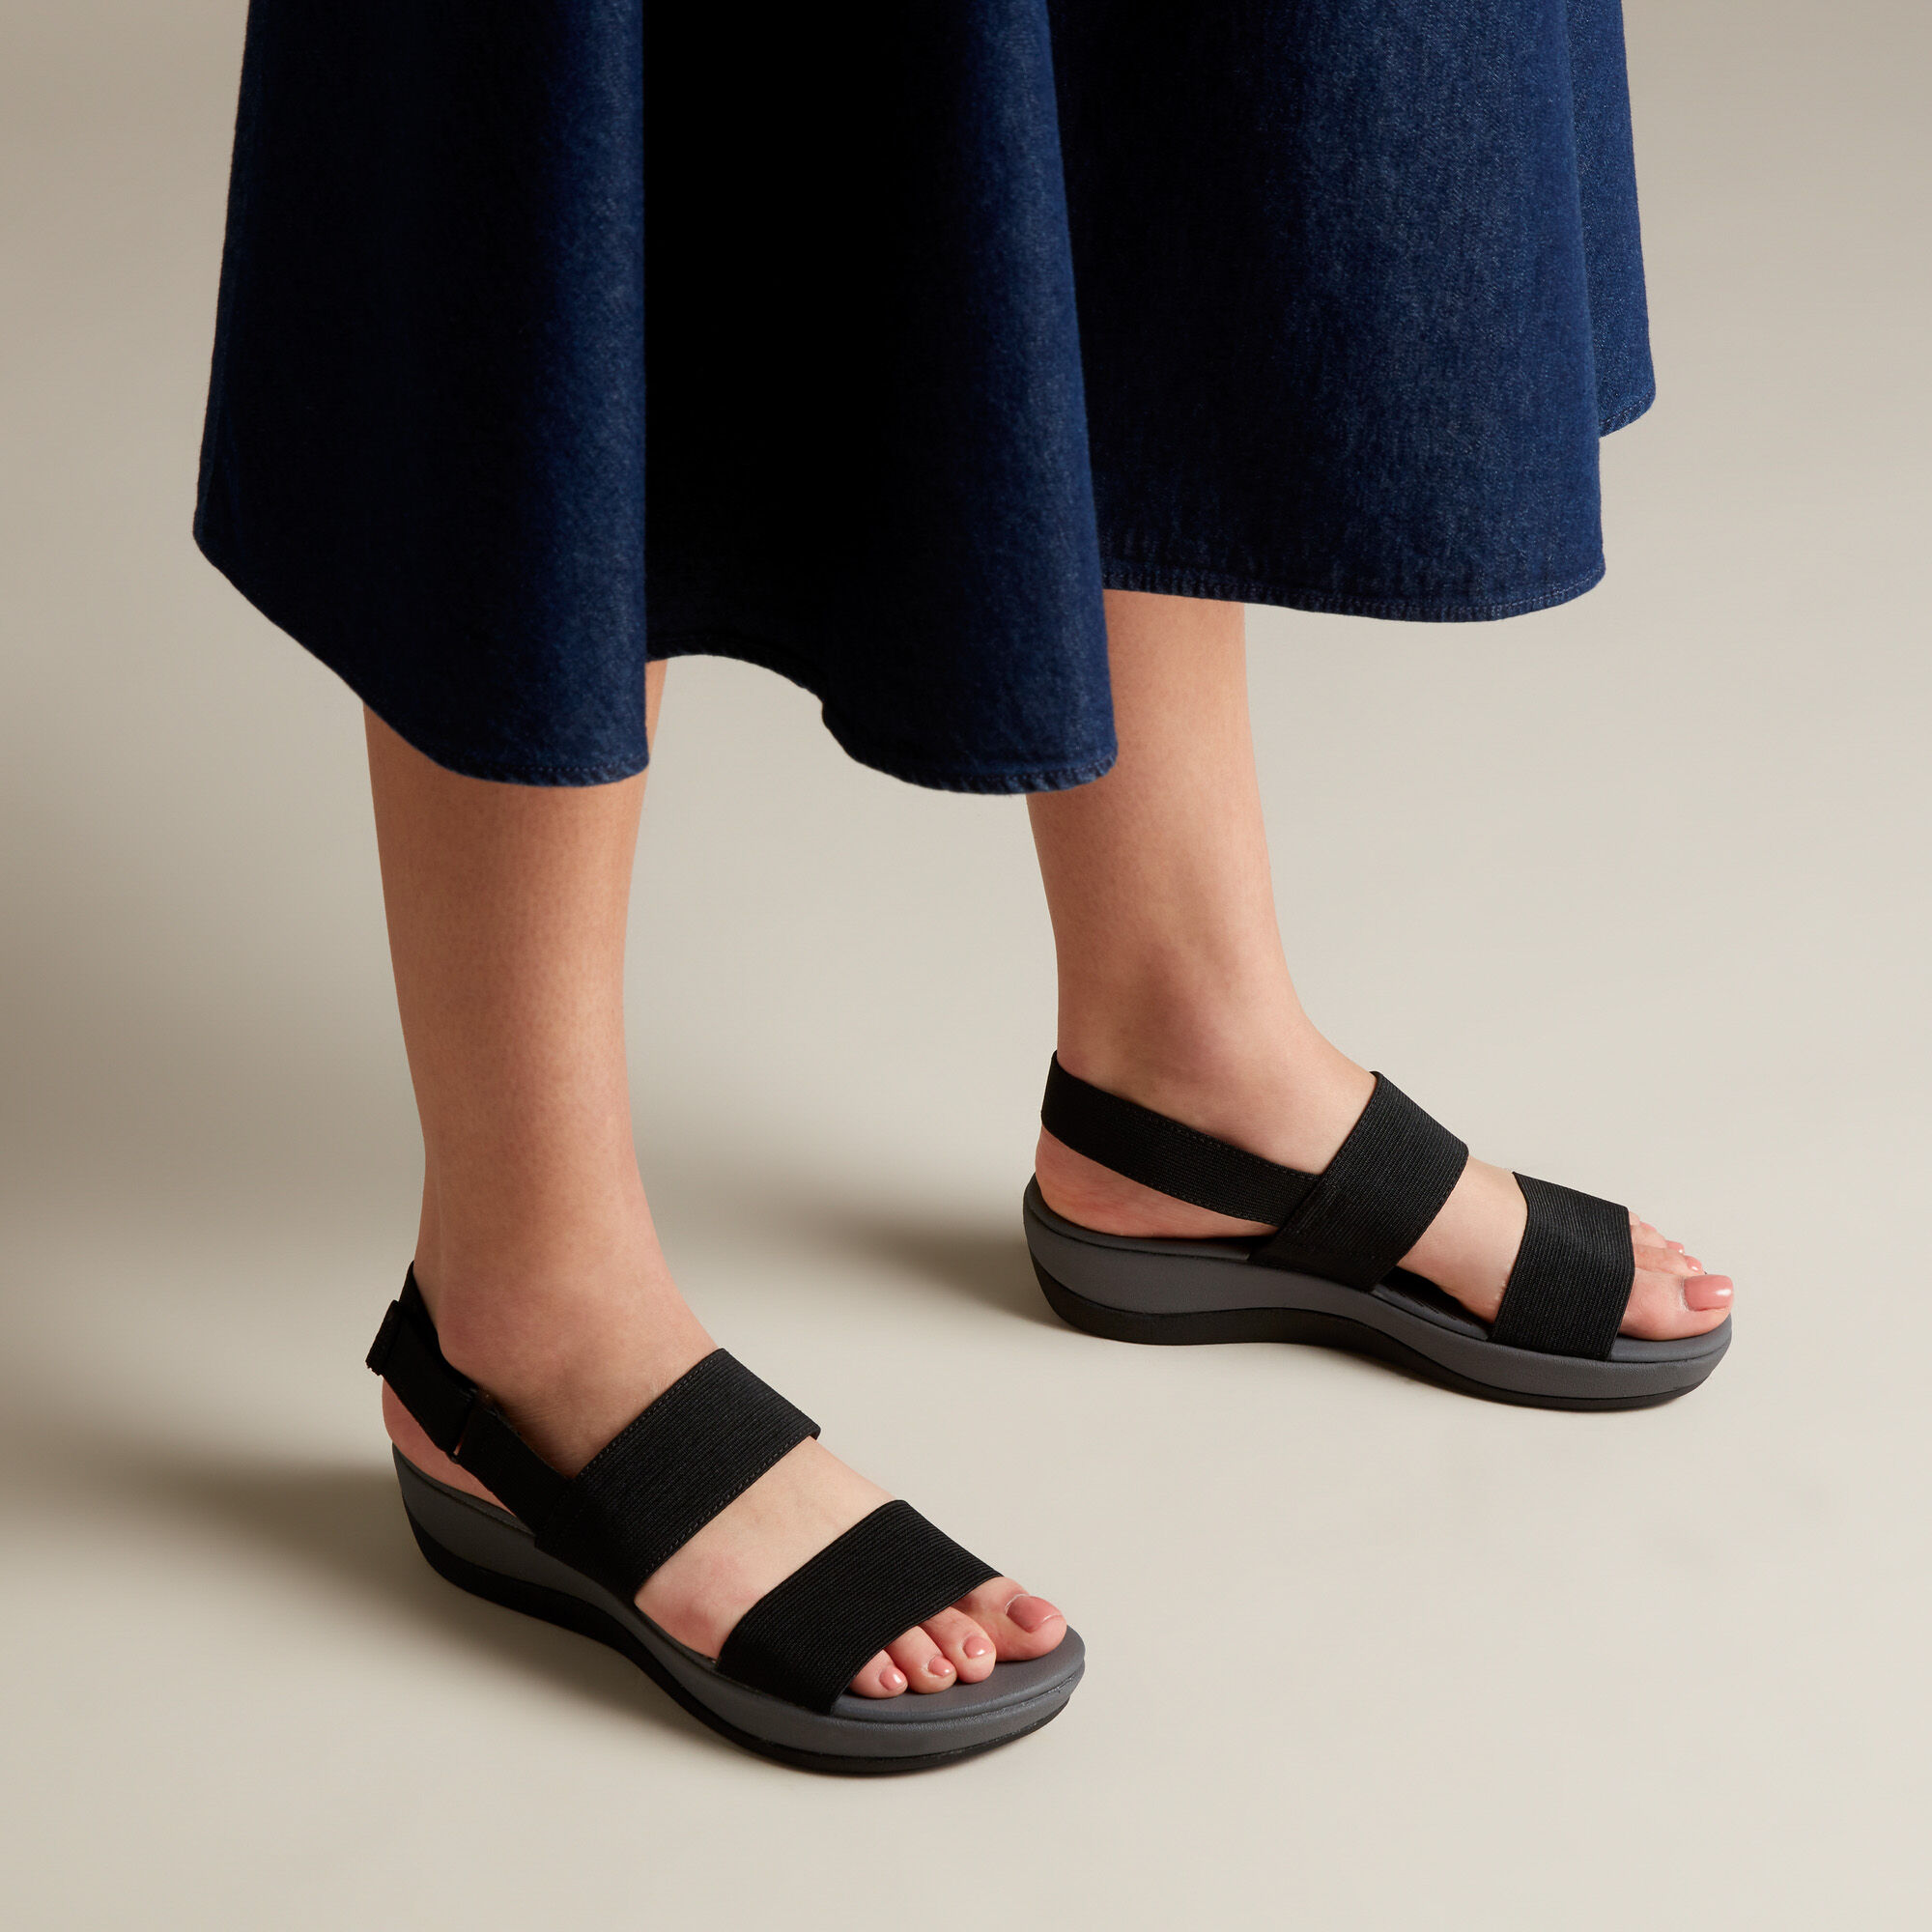 Sandals - Arla Jacory | Clarks